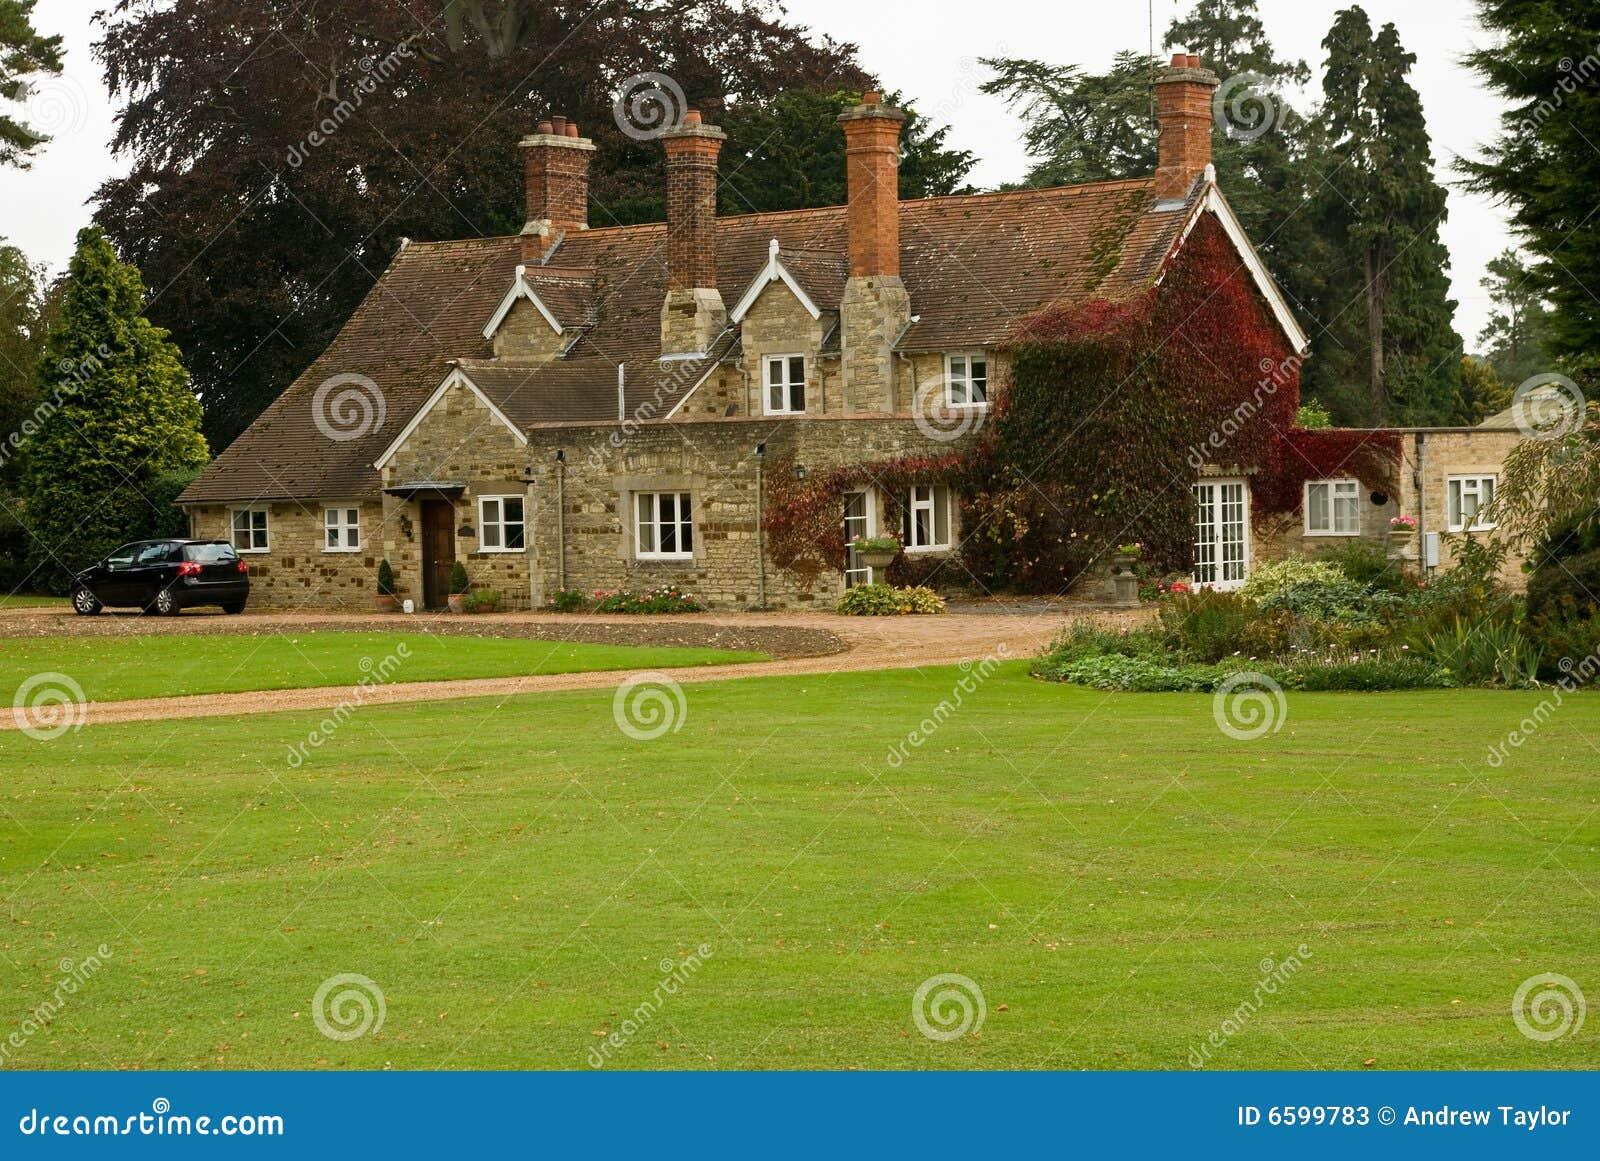 Un 39 altra casa di campagna inglese fotografie stock for Piani di campagna inglese